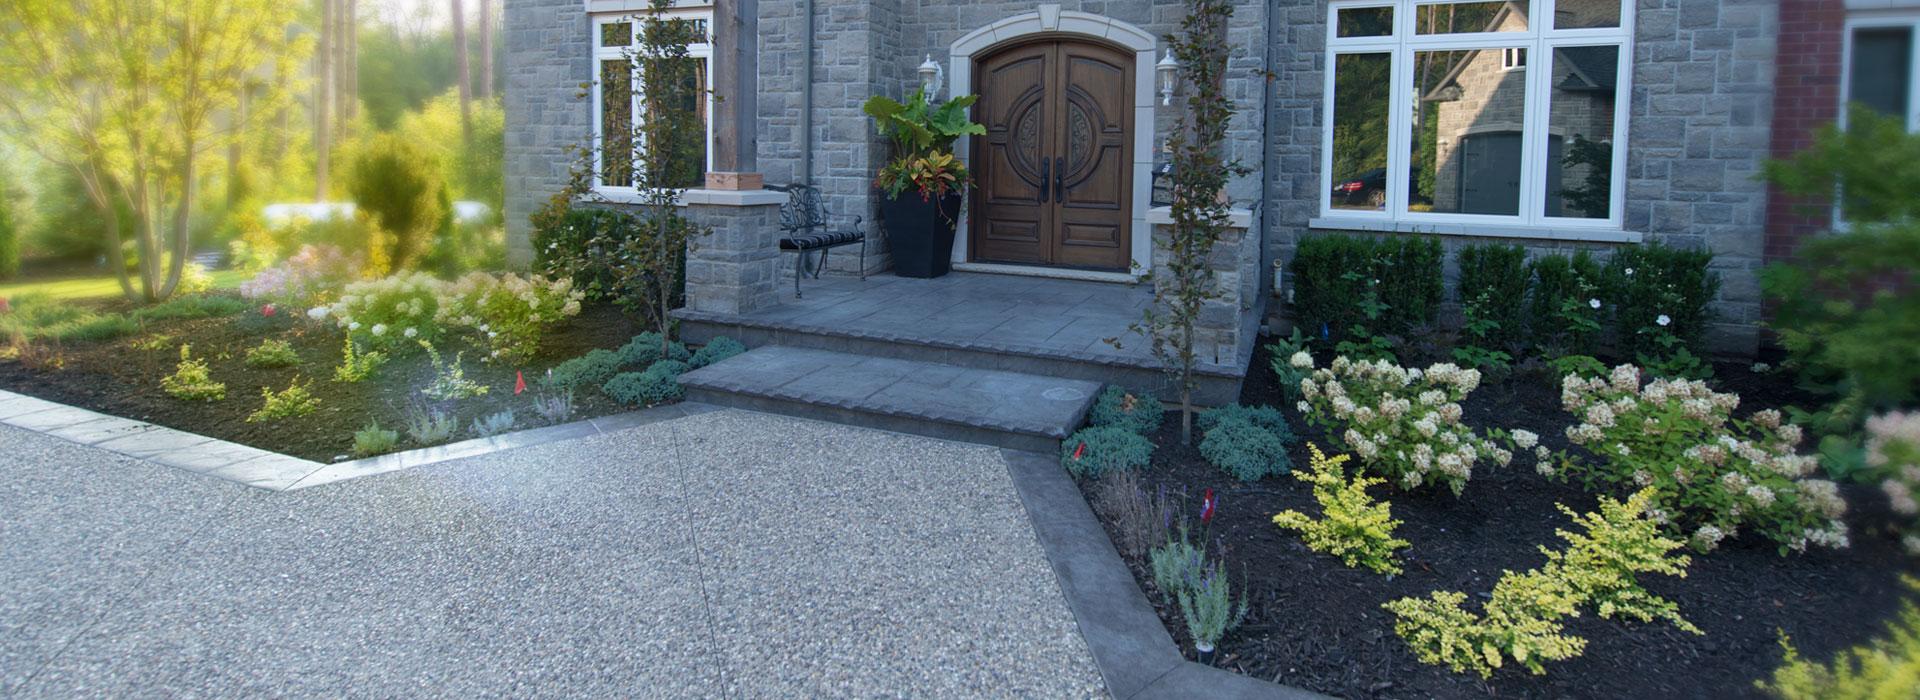 house-front-porch